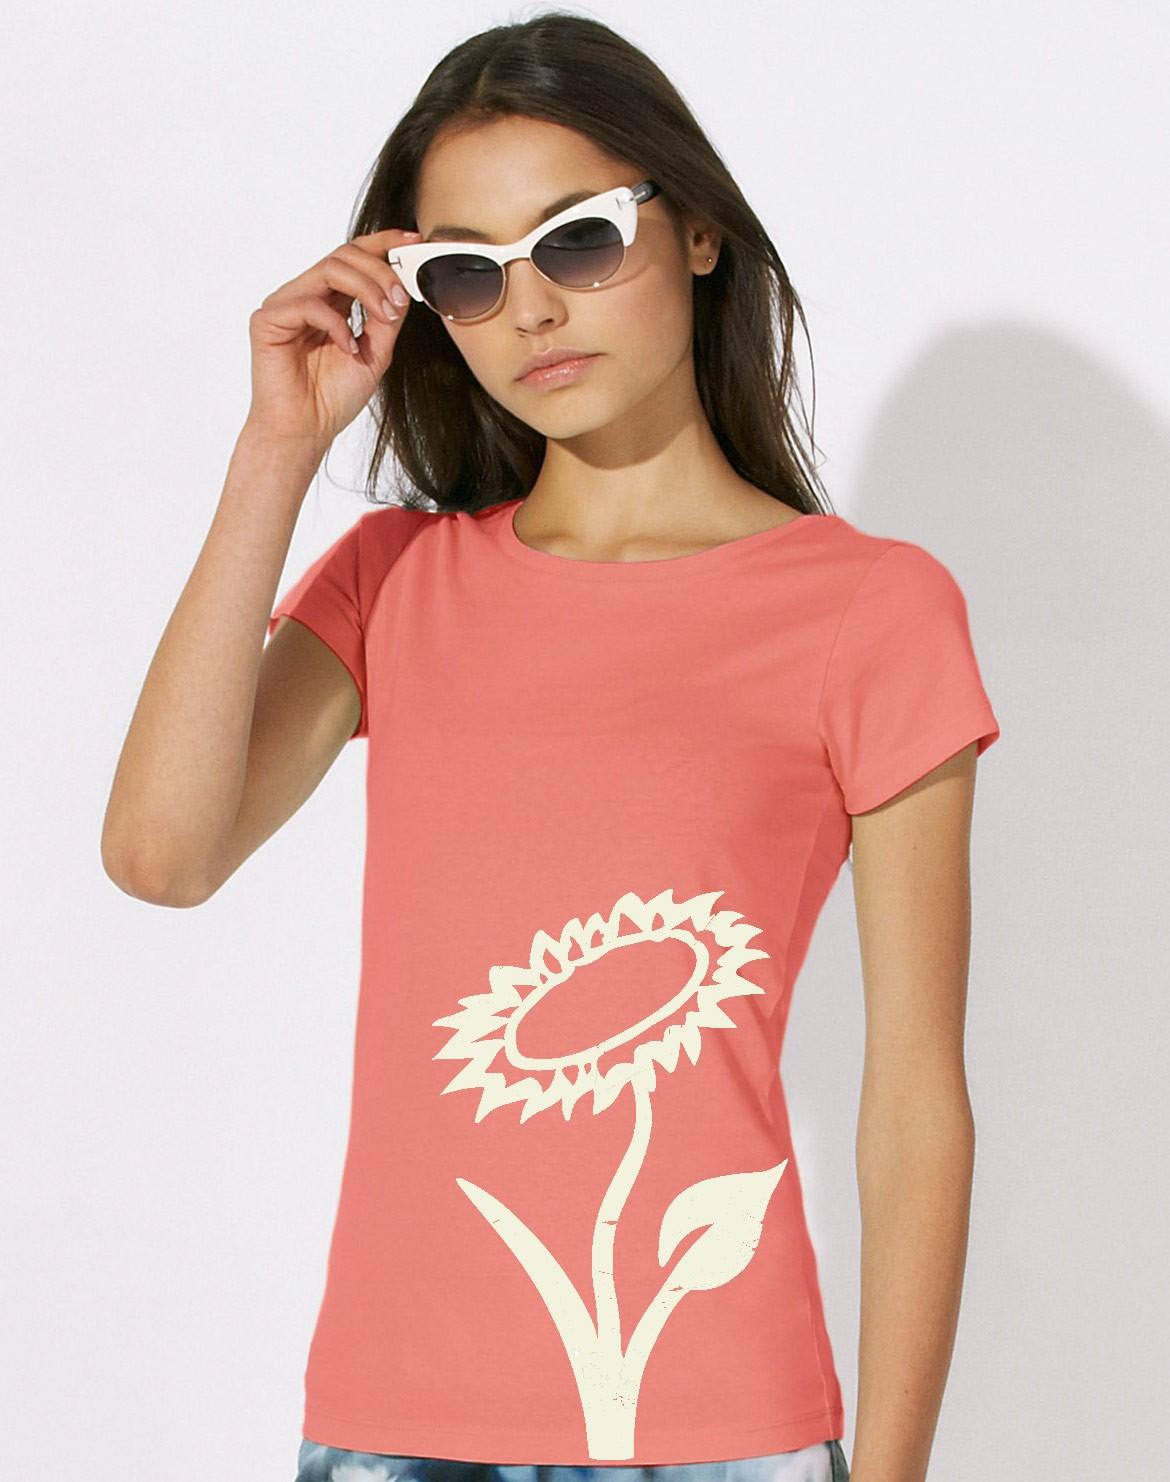 Vlower Shirt